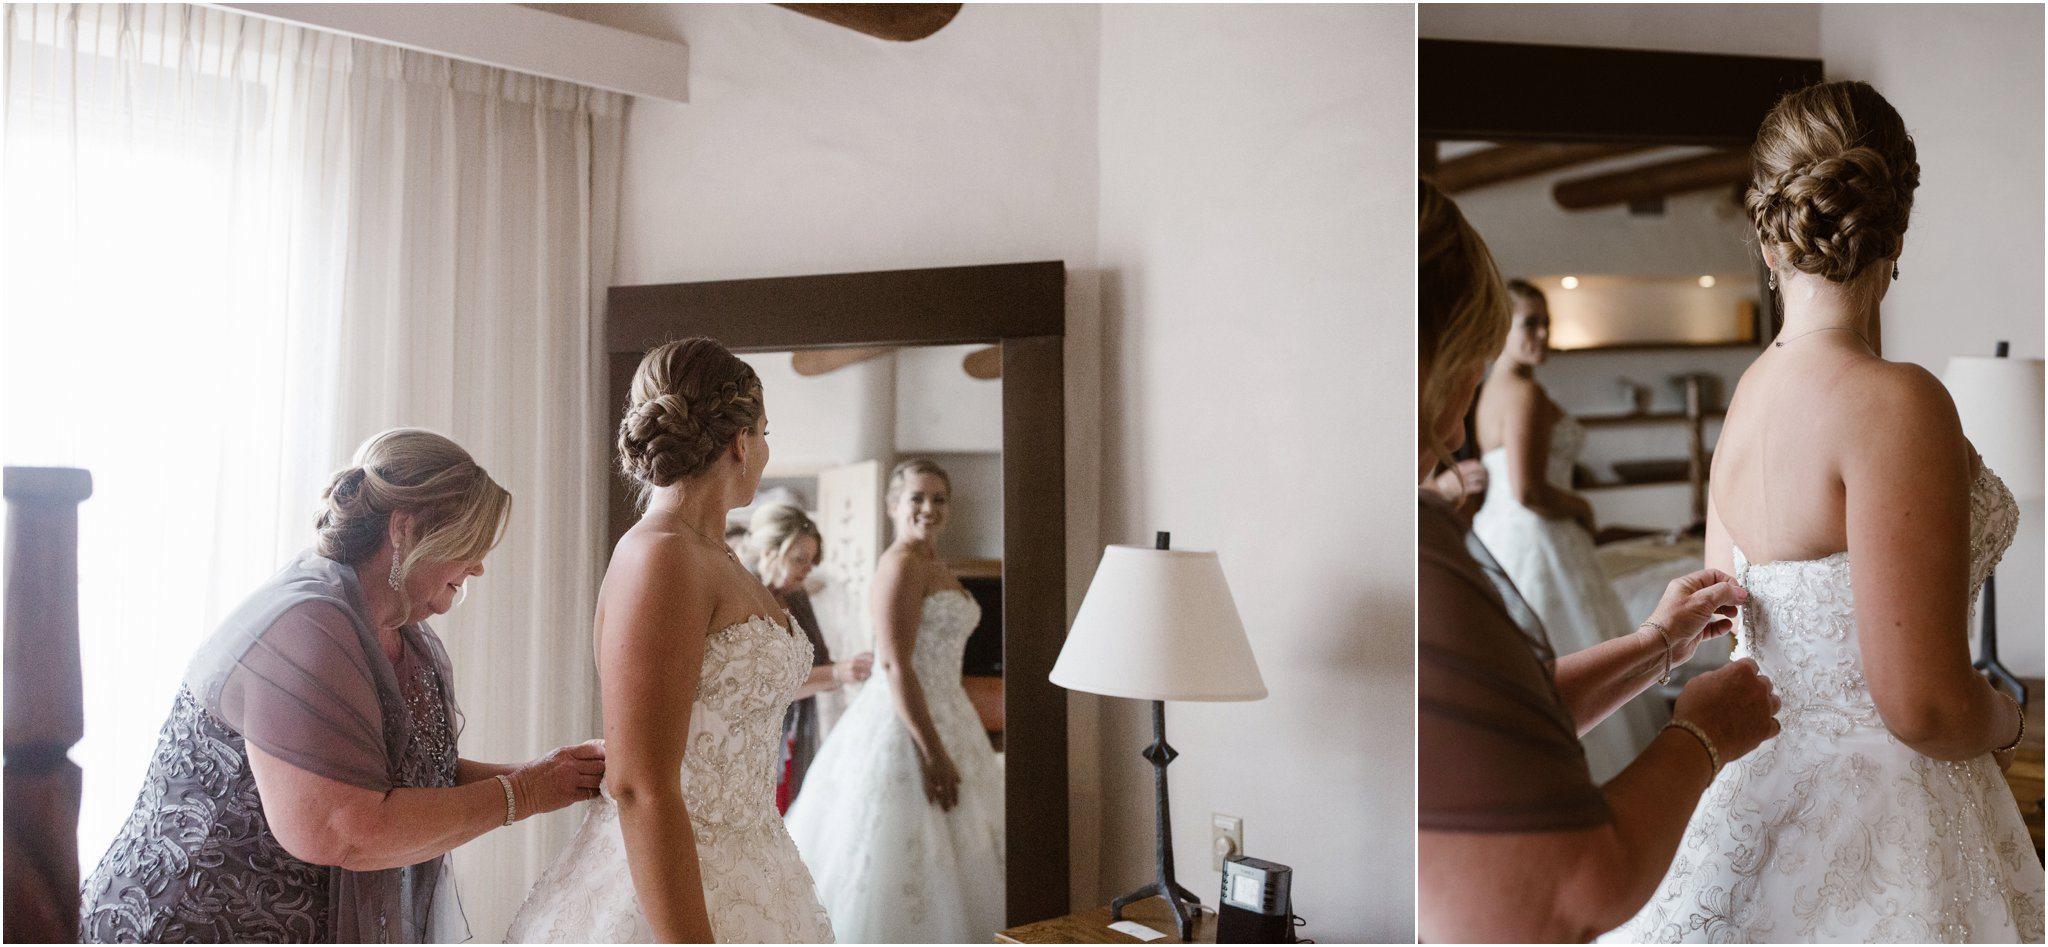 0025albuquerque-wedding-photographer_-santa-fe-wedding-photographer_-southwest-wedding-photography_-blue-rose-studio